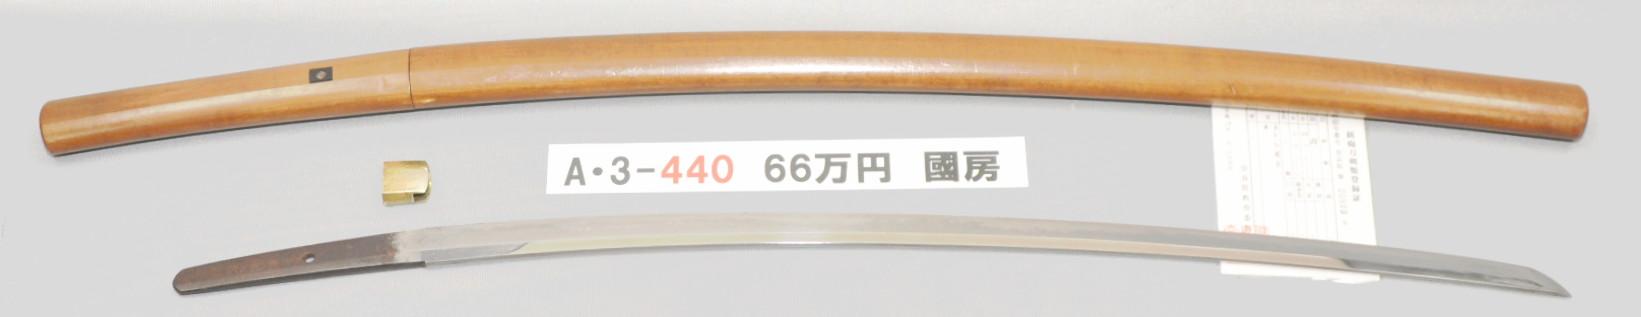 A3440